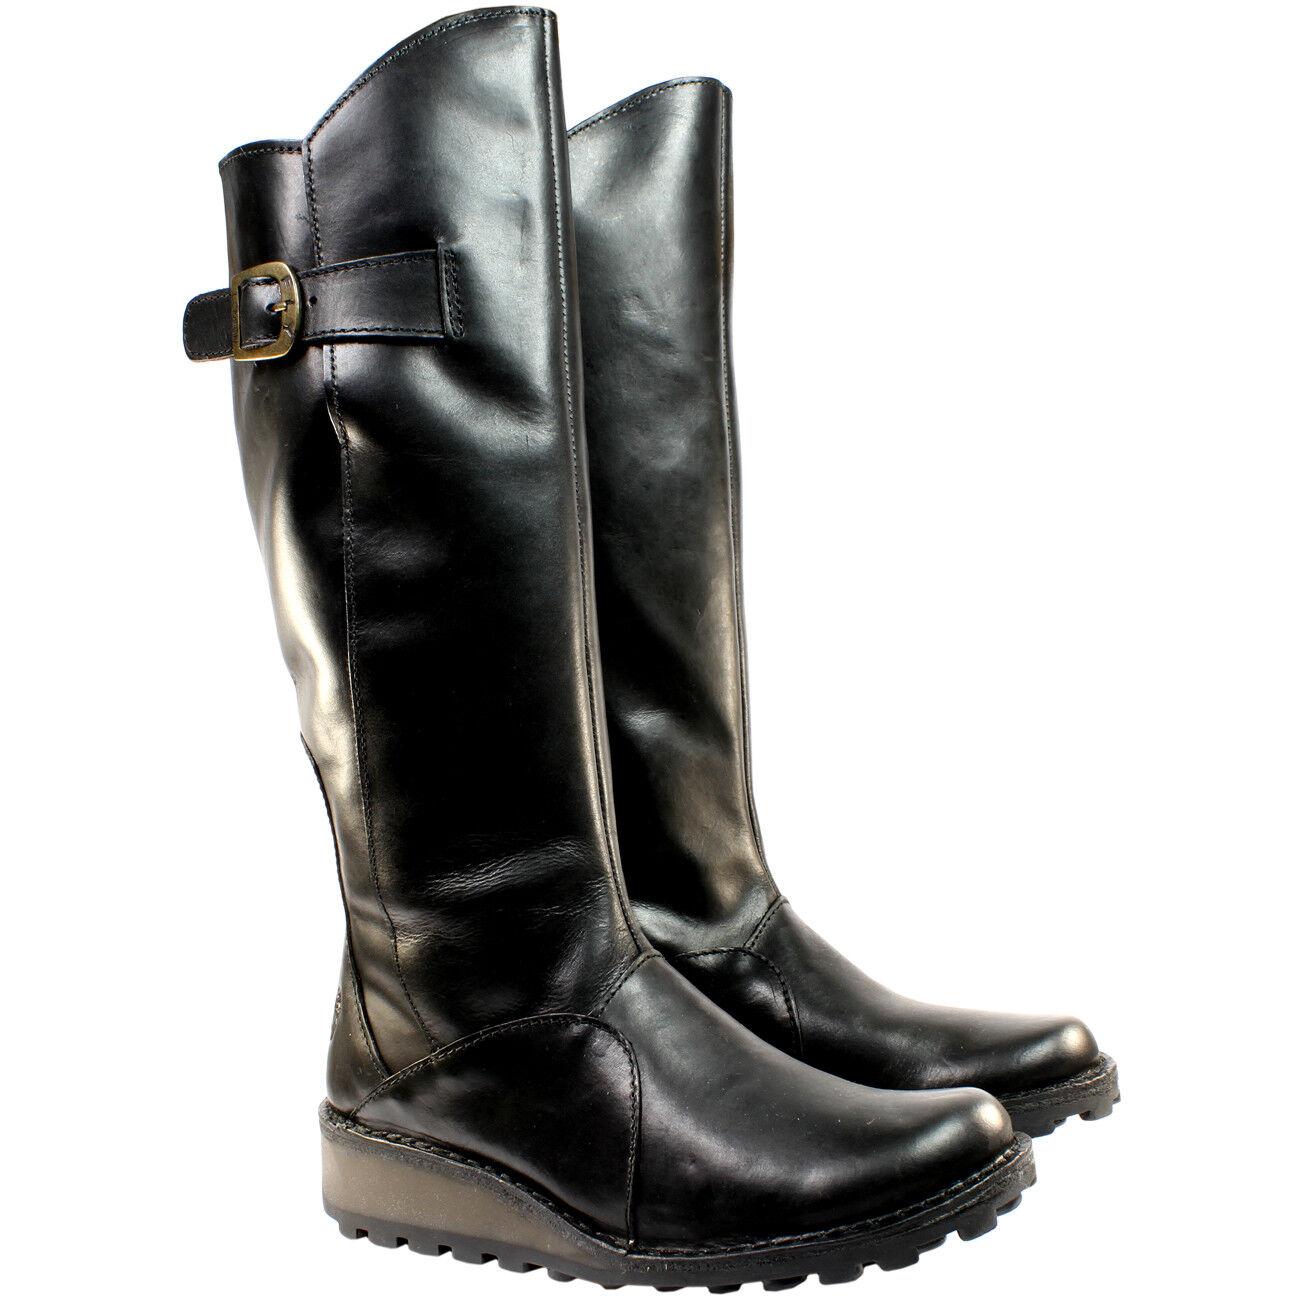 FLY LONDON Mol 2 Niedrig, knielange Stiefel schwarz